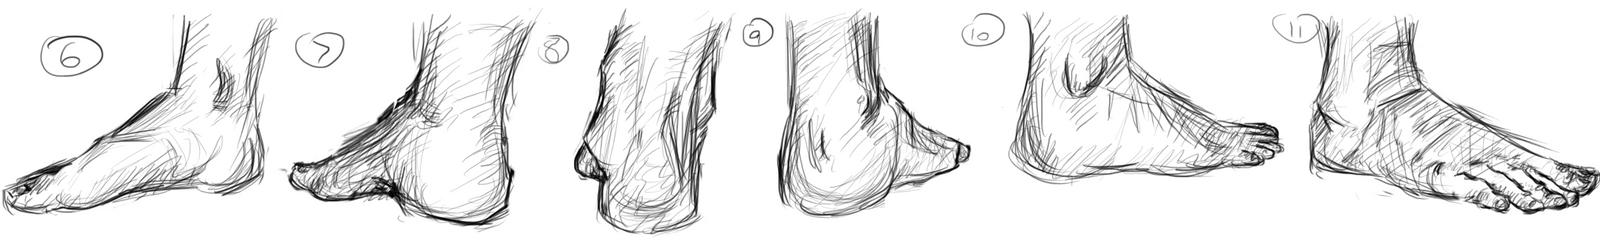 Feet (6-11) by muslacrima